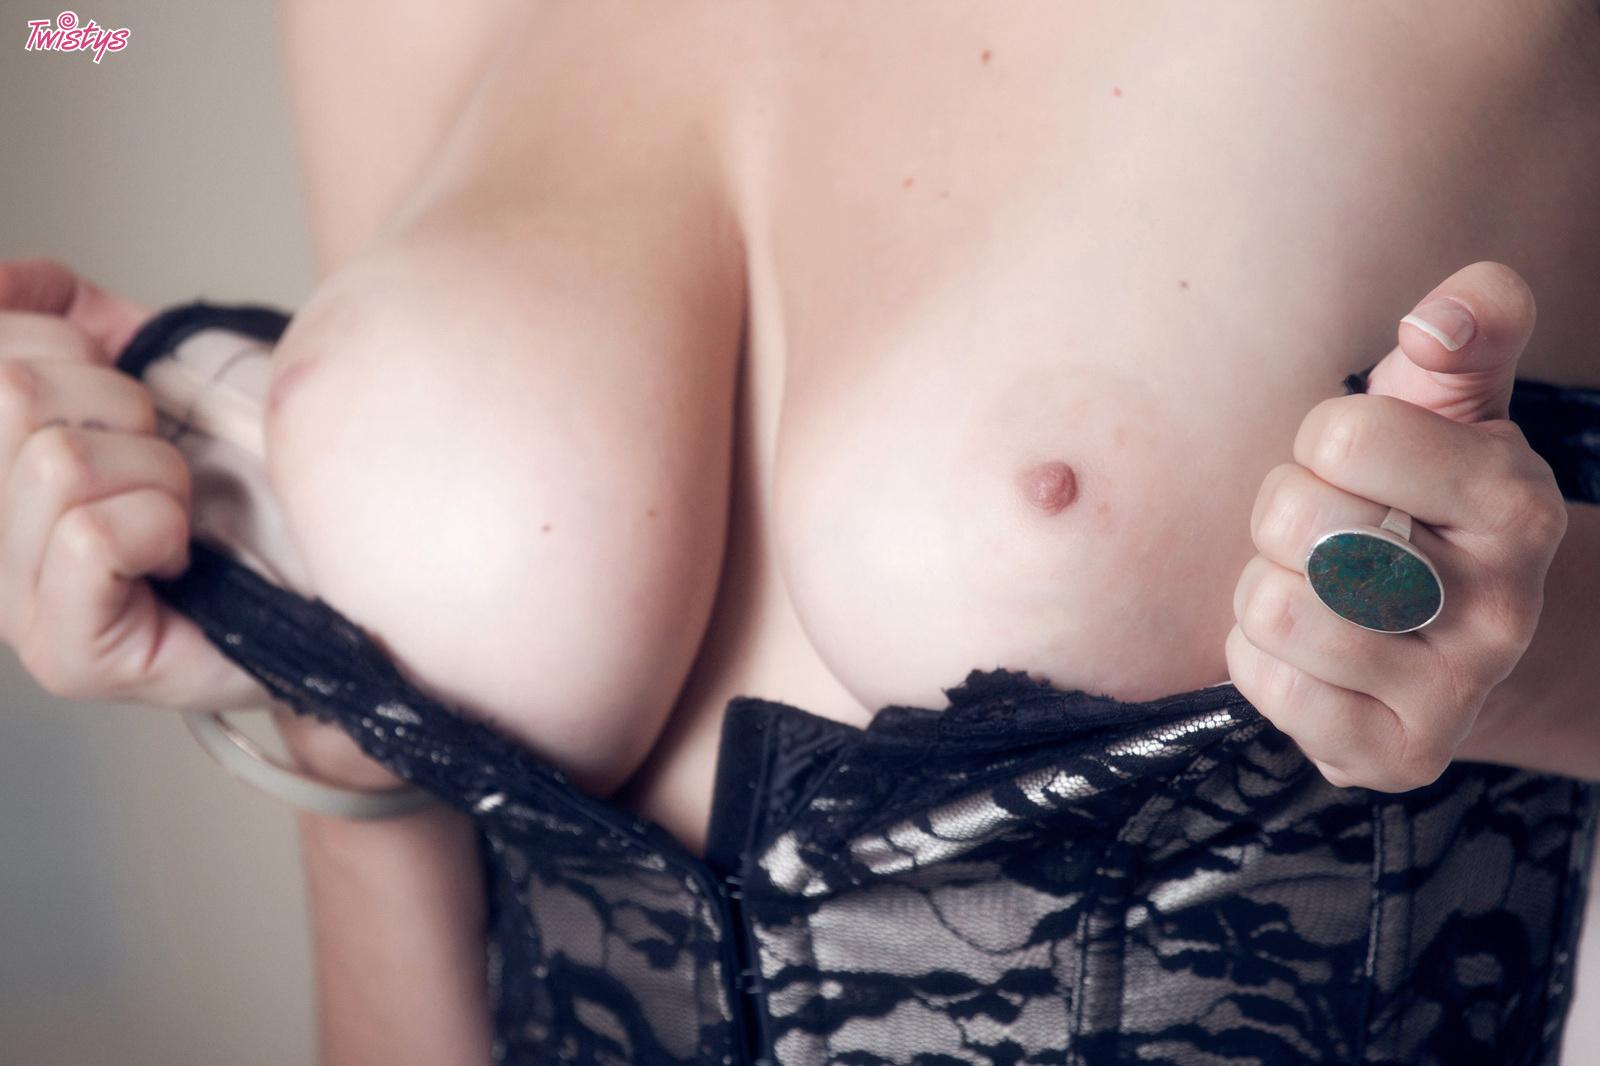 shay-laren-corset-blonde-tits-nude-twistys-09